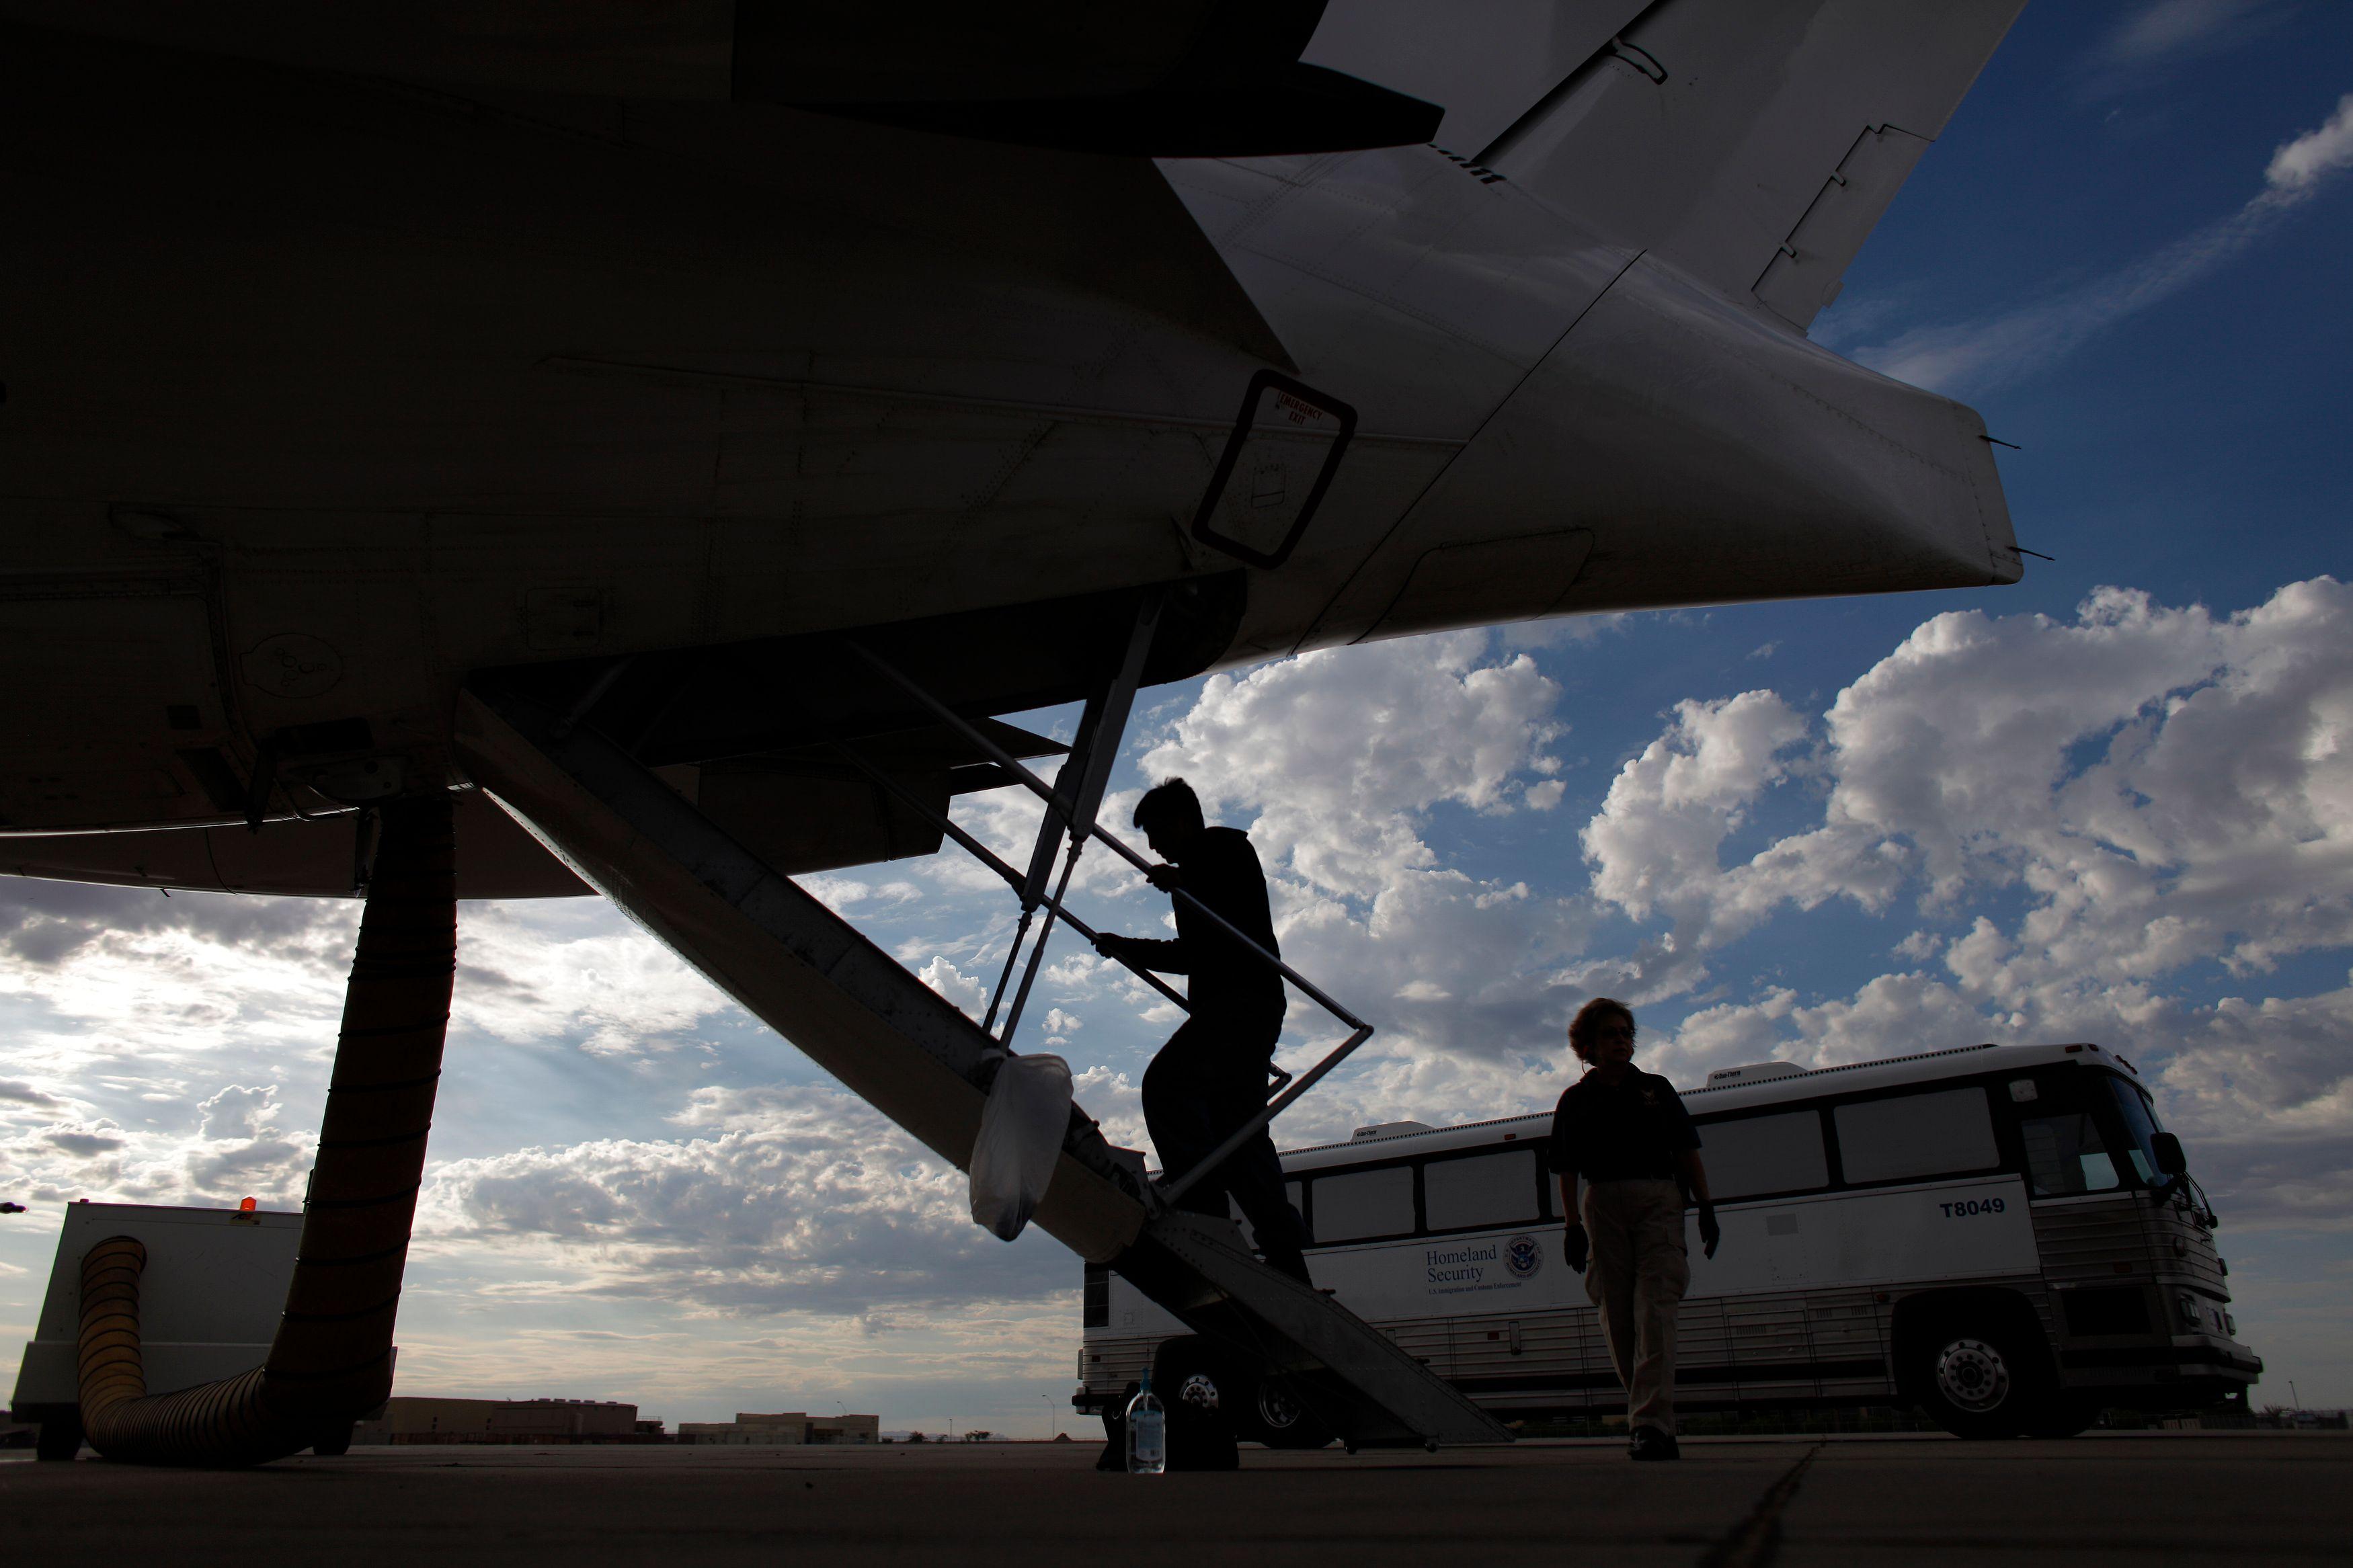 Les expatriations ont bondi de 40% en 2013.